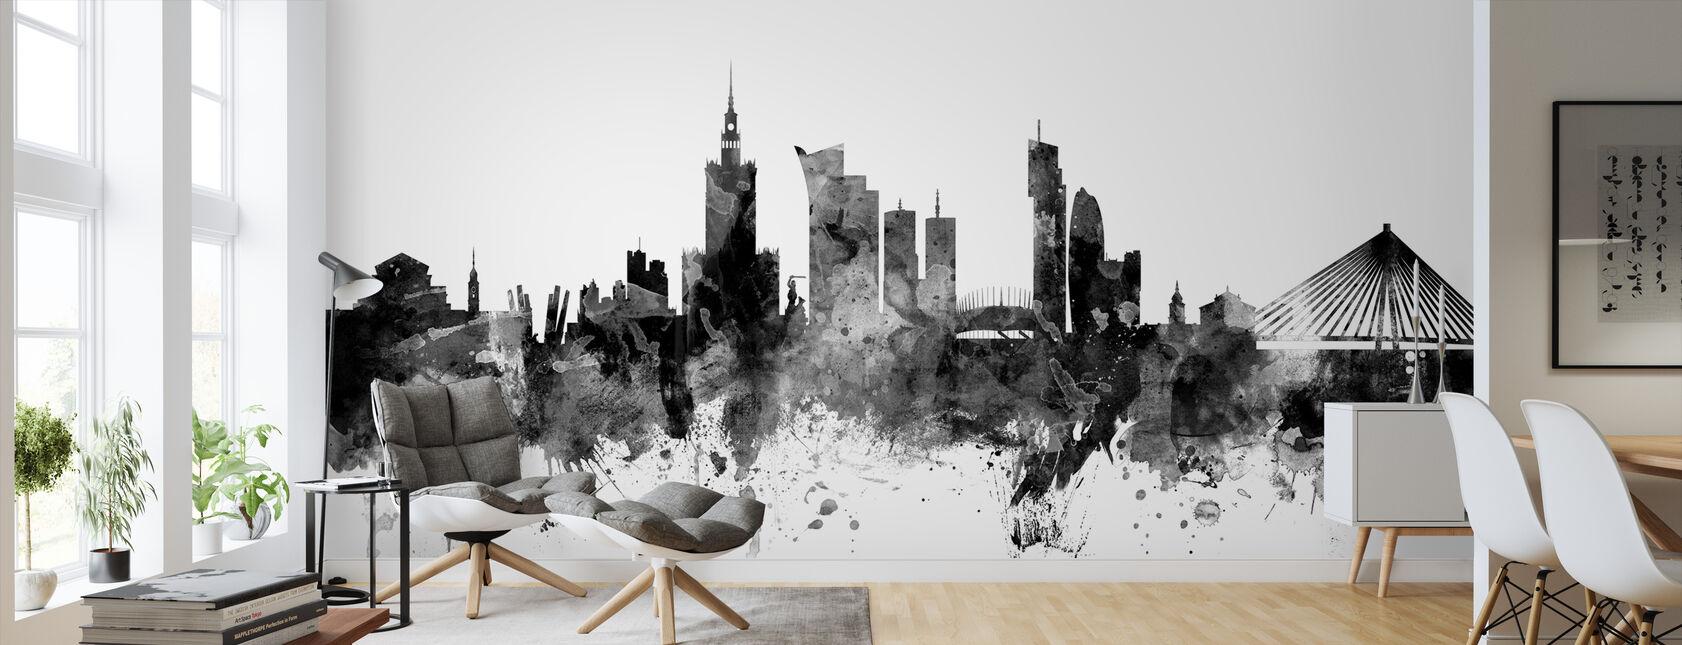 Warsaw Skyline Black - Wallpaper - Living Room